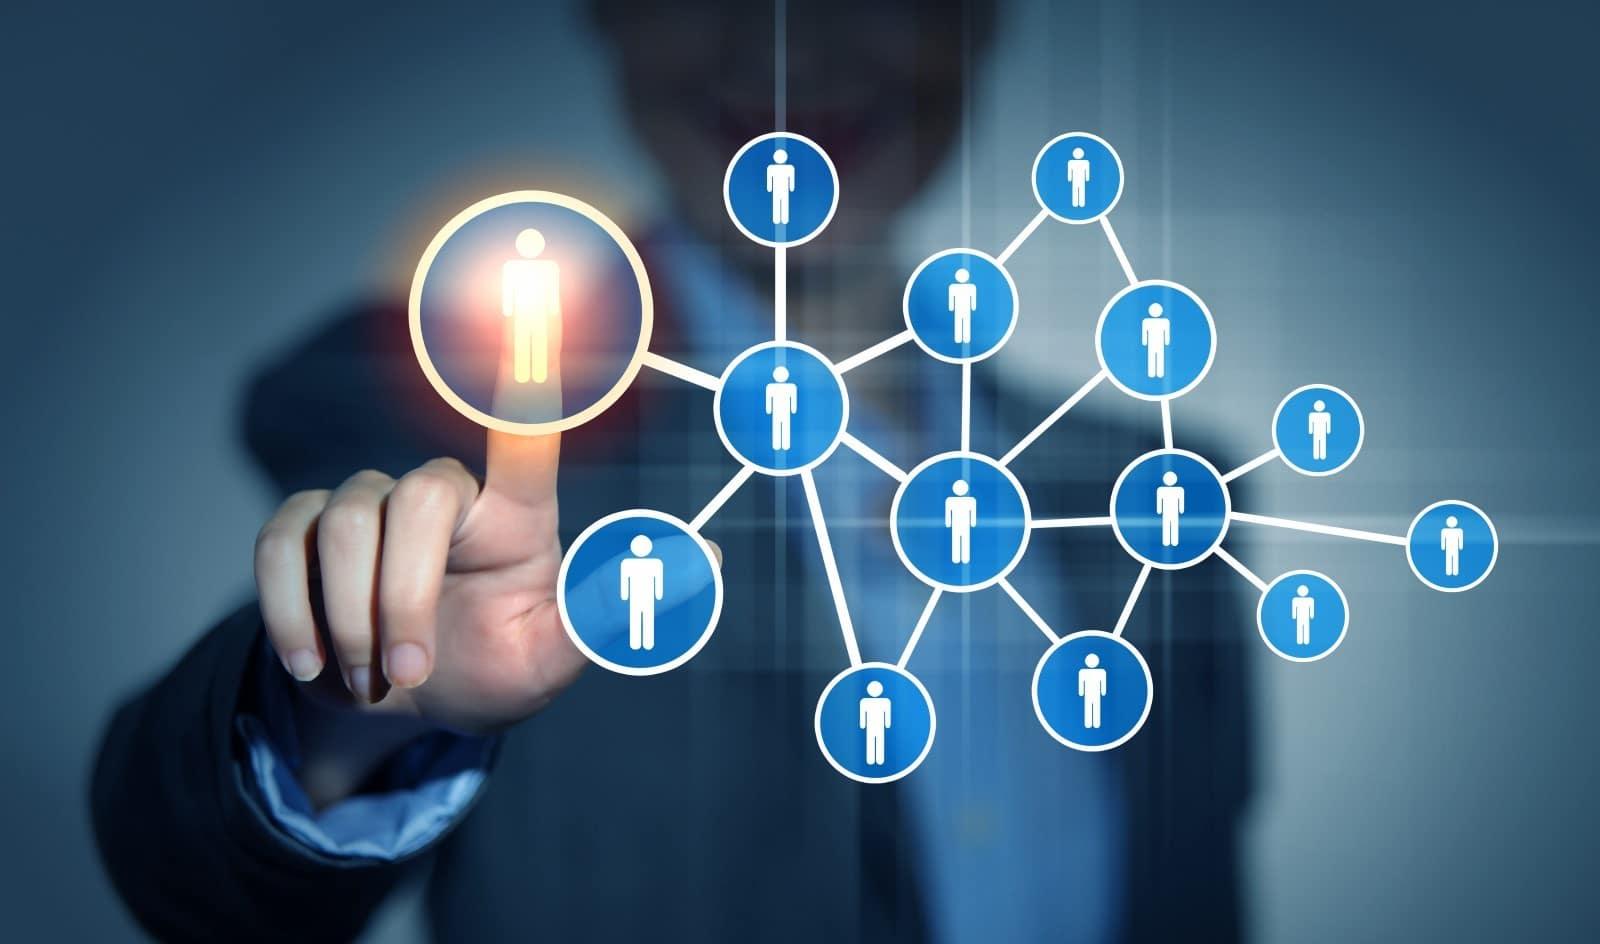 CEOs ter perfil nas redes sociais